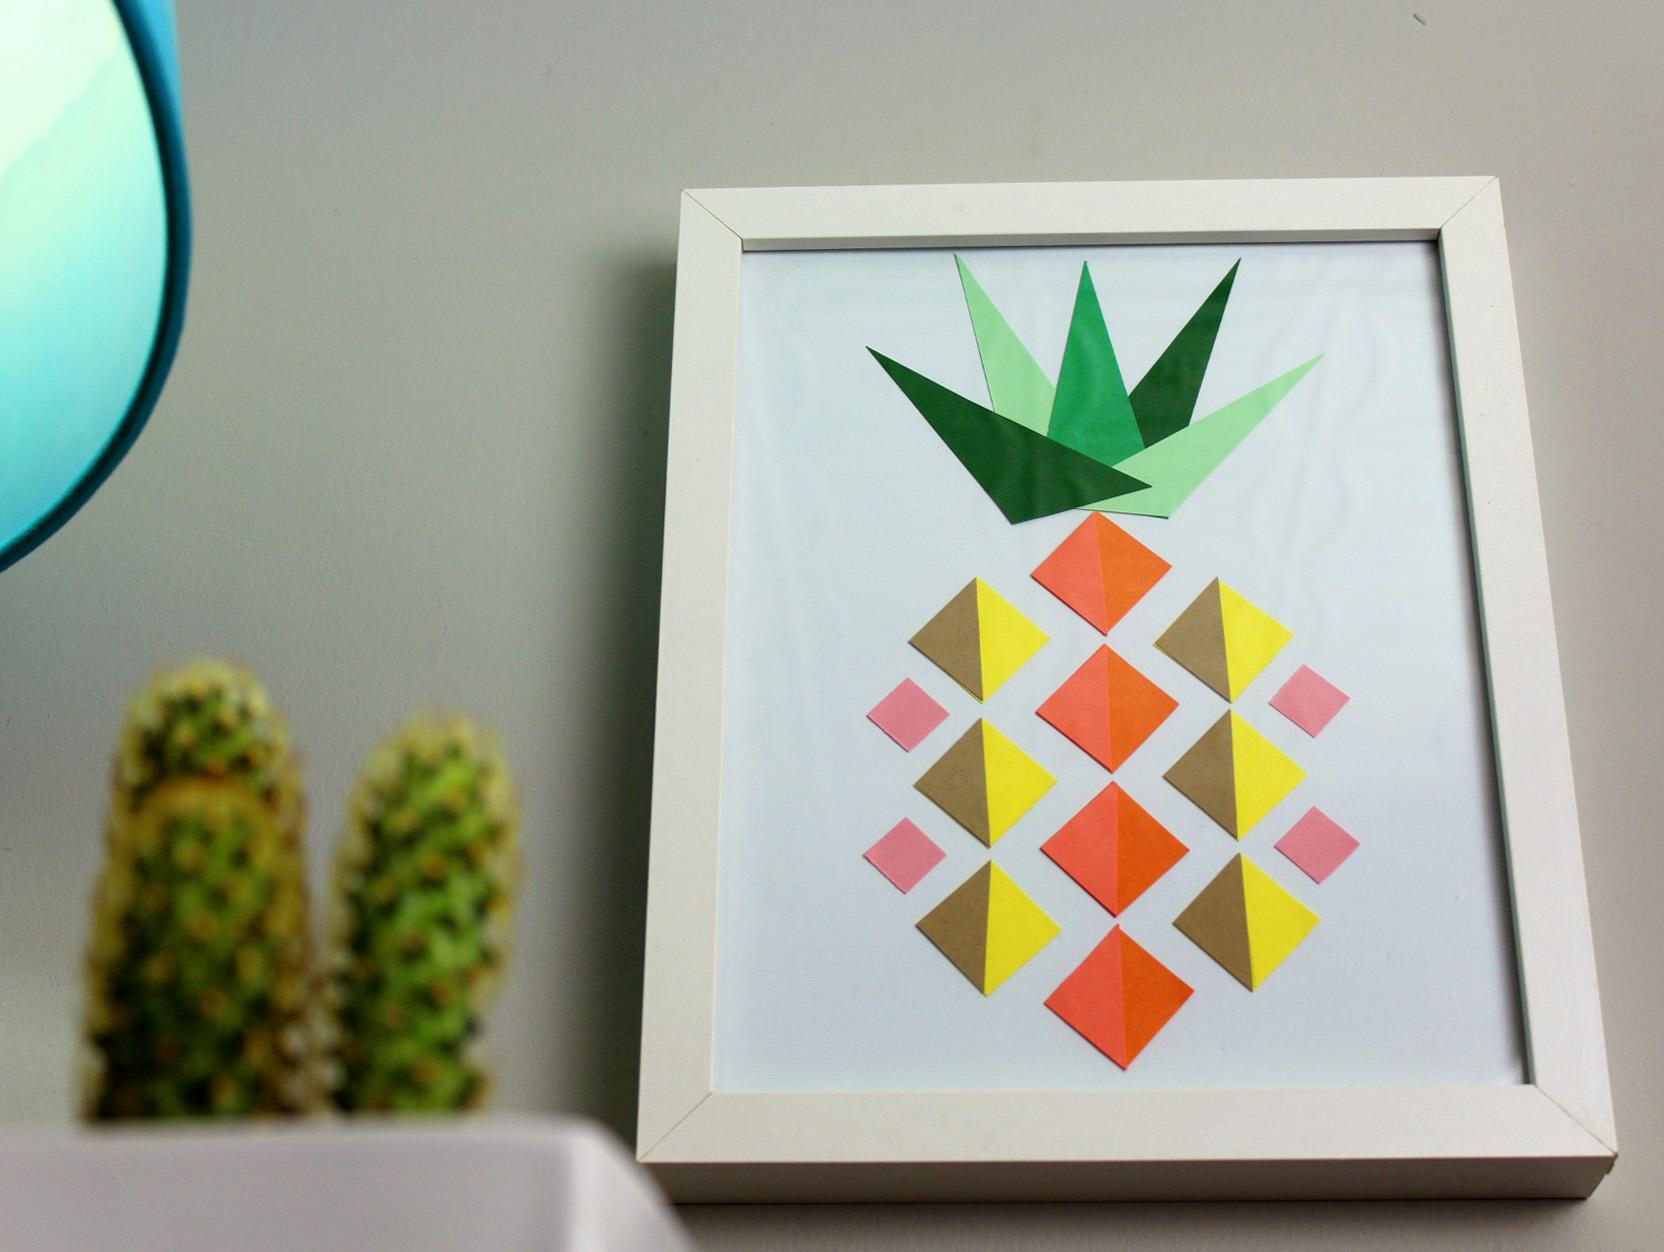 Meg allan cole diy gallery geometric pineapple paper art hgtv handmade solutioingenieria Images